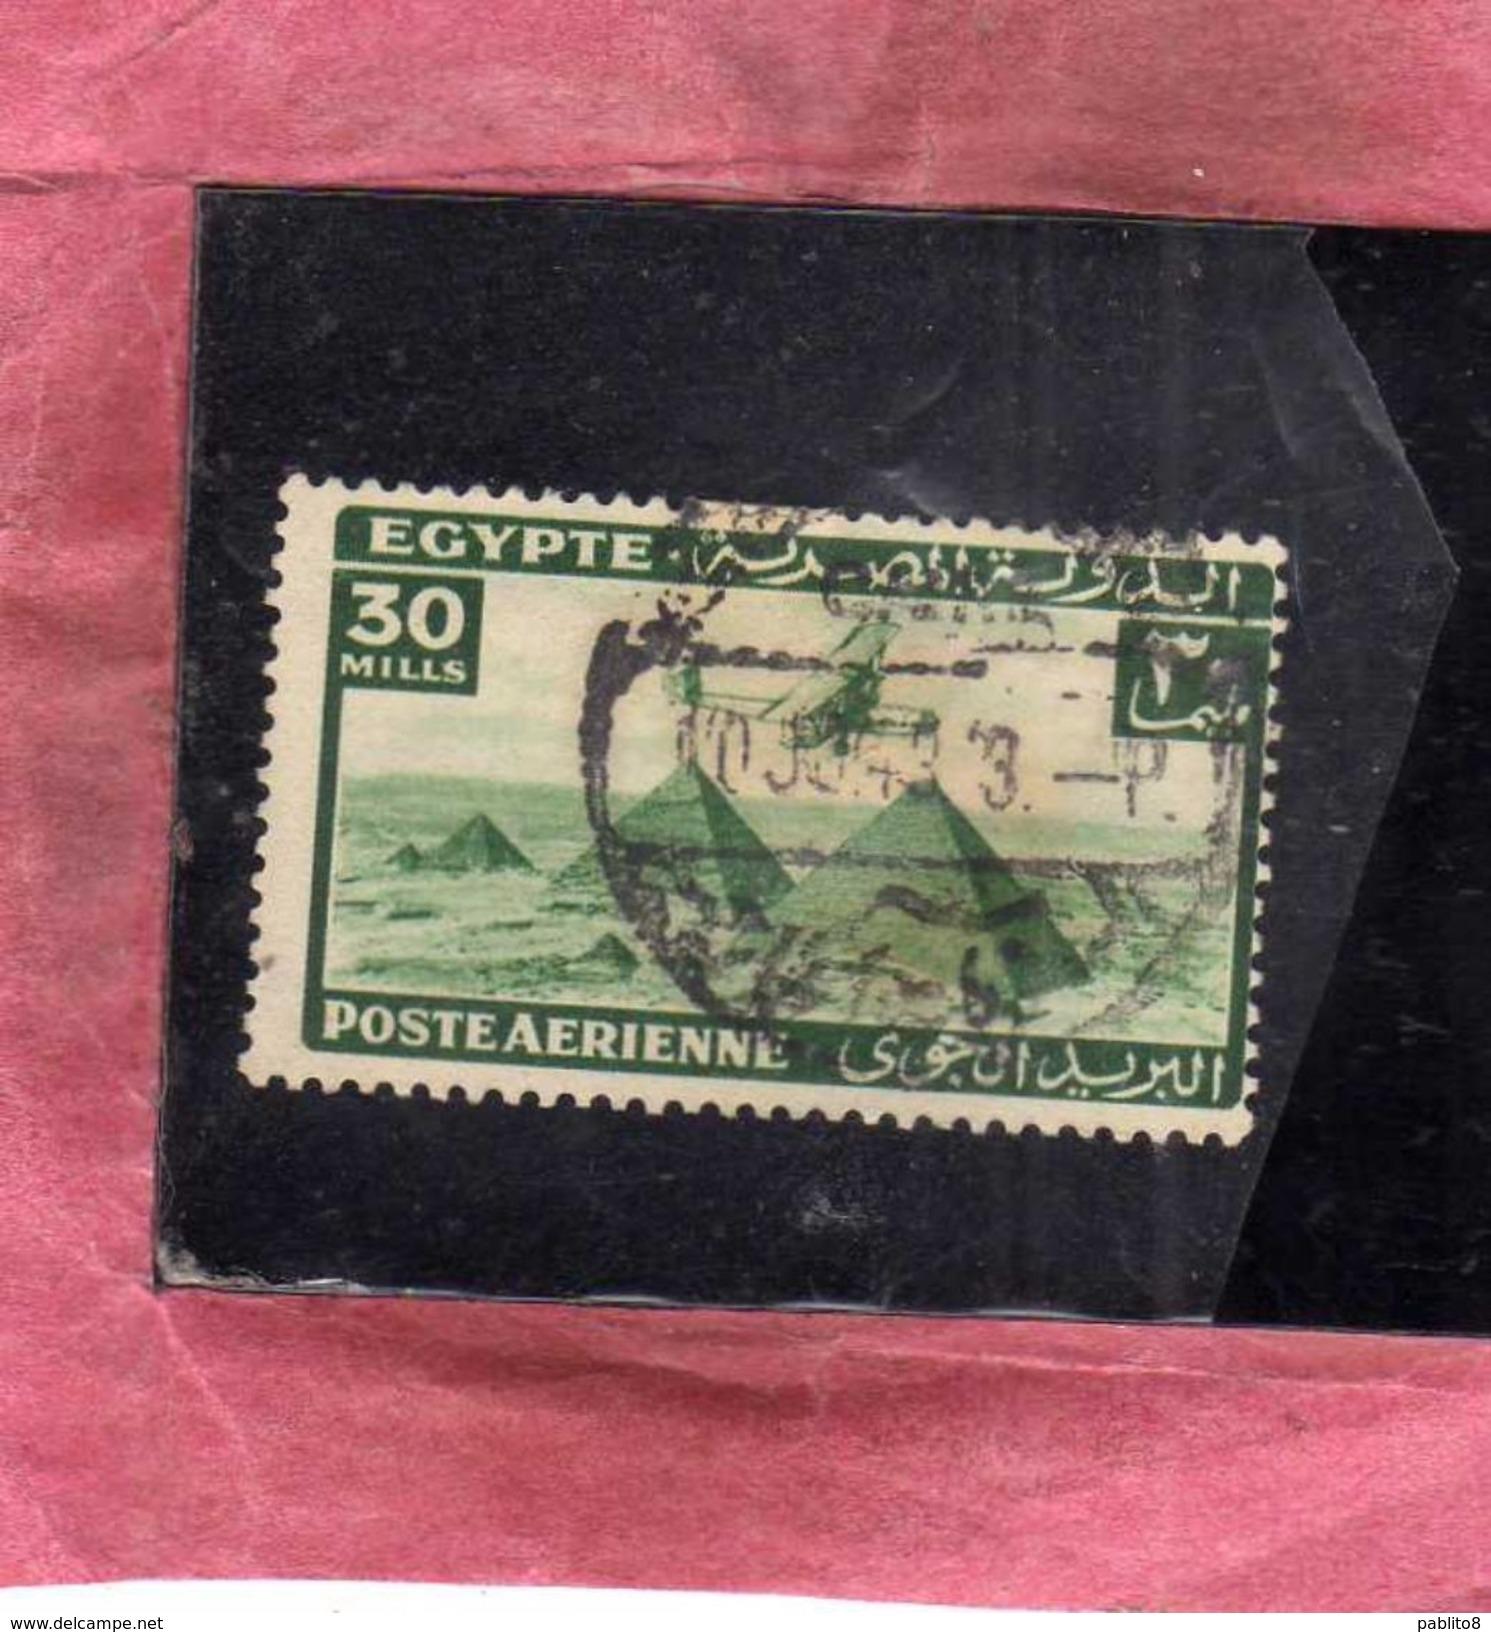 EGYPT EGITTO 1933 1938 AIR MAIL POSTA AEREA AIRPLANE OVER GIZA PYRAMIDS 30m USATO USED OBLITERE' - Posta Aerea